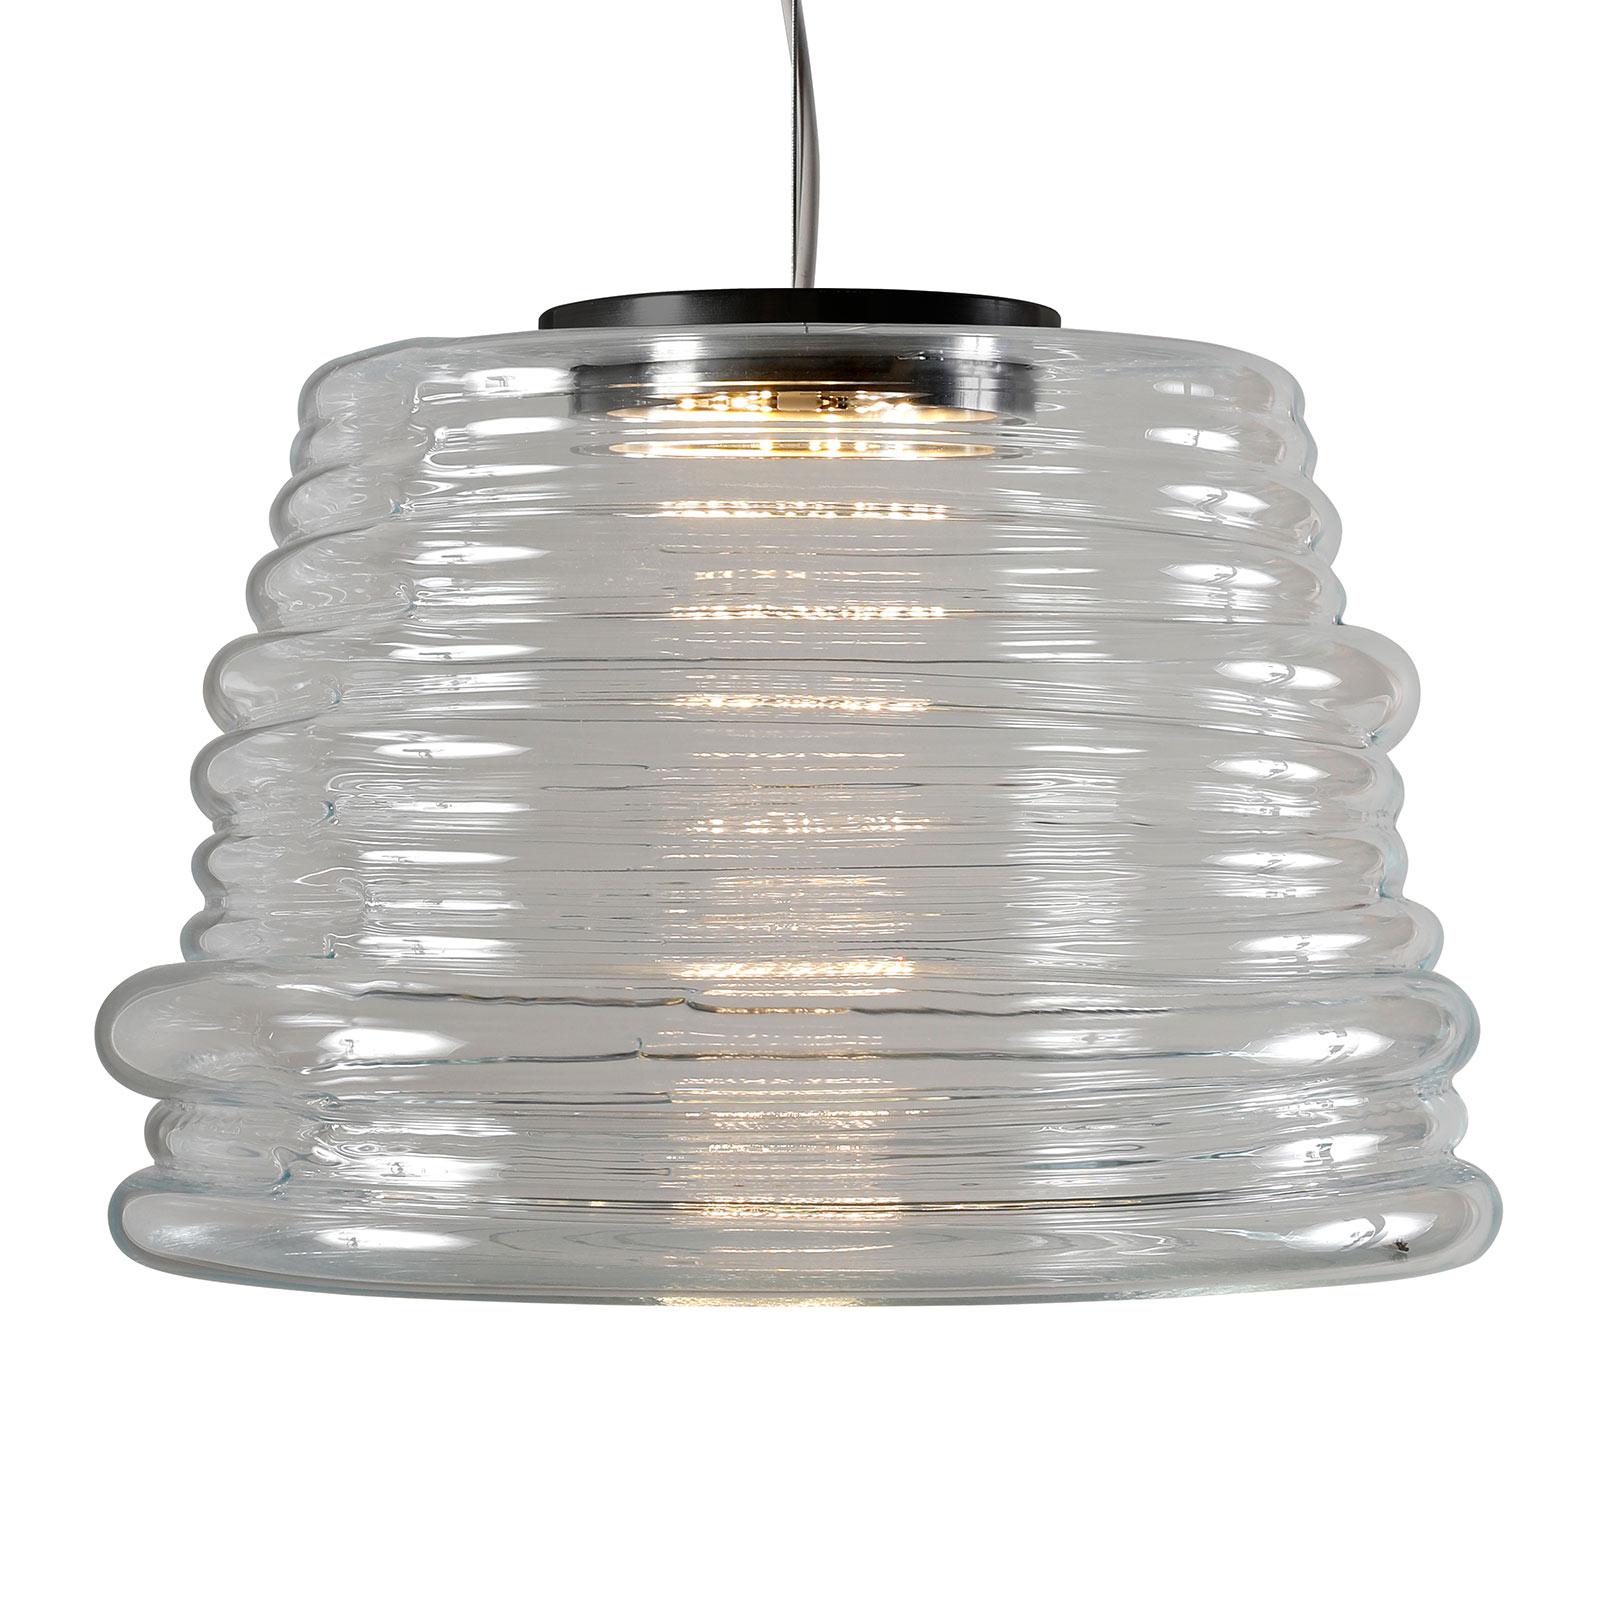 Karman Bibendum lampa wisząca LED, Ø 35 cm